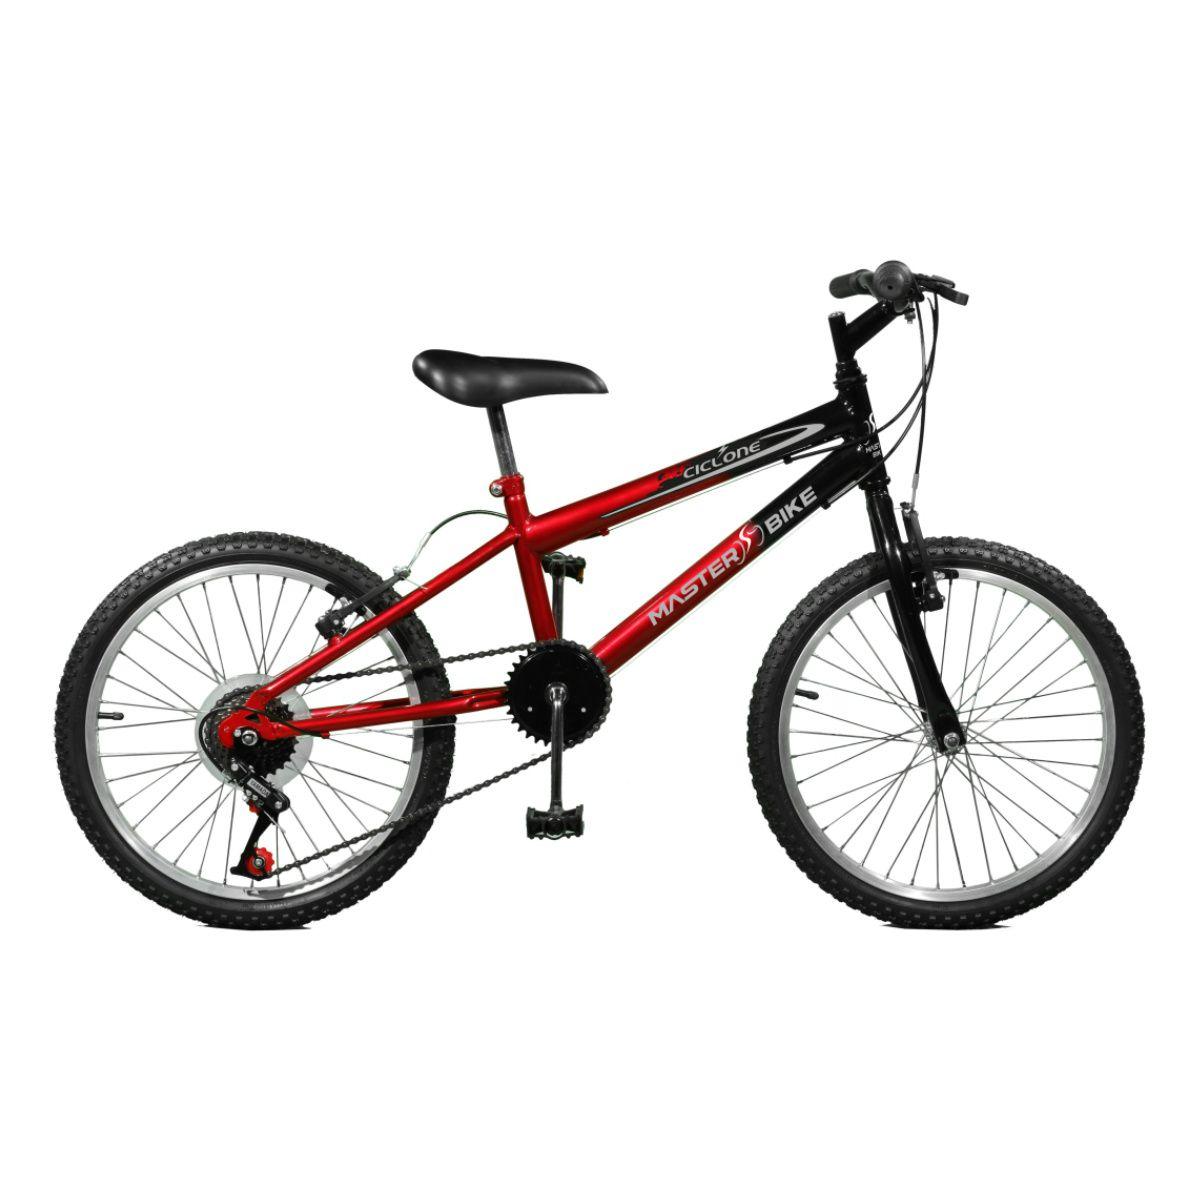 Bicicleta Master Bike Aro 20 Ciclone Plus 7 Marchas V-Brake Vermelho/Preto